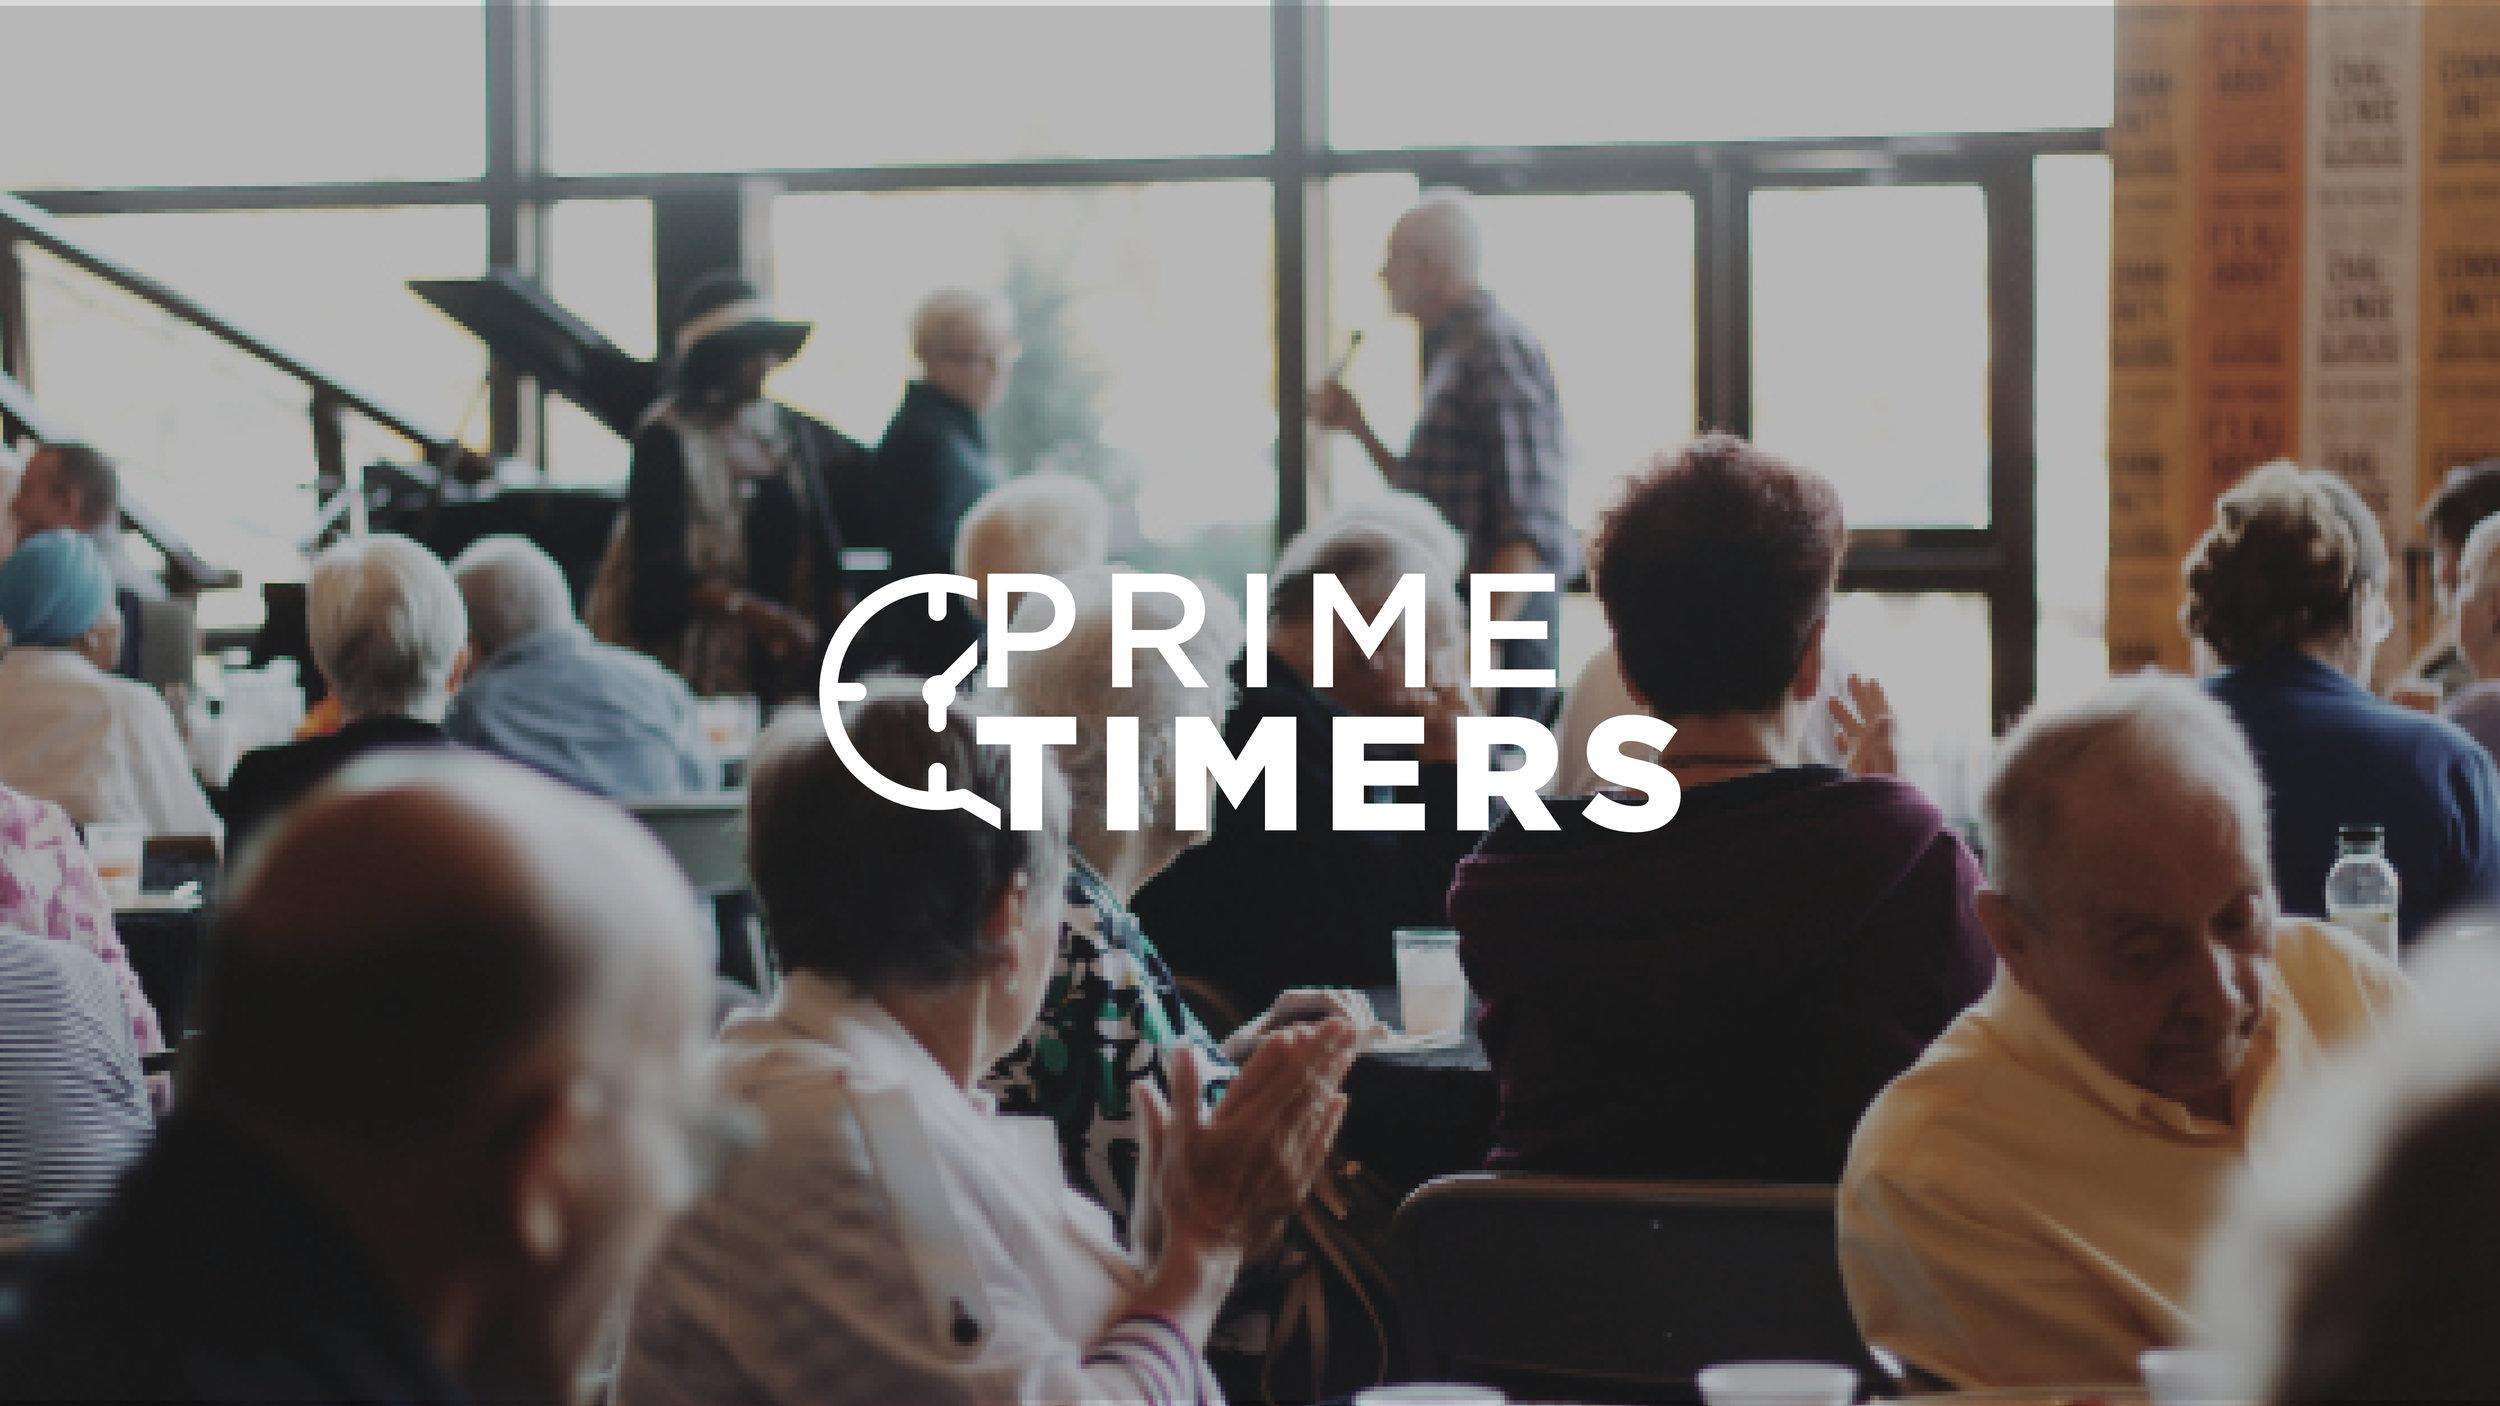 Life Center Central | Prime Timers